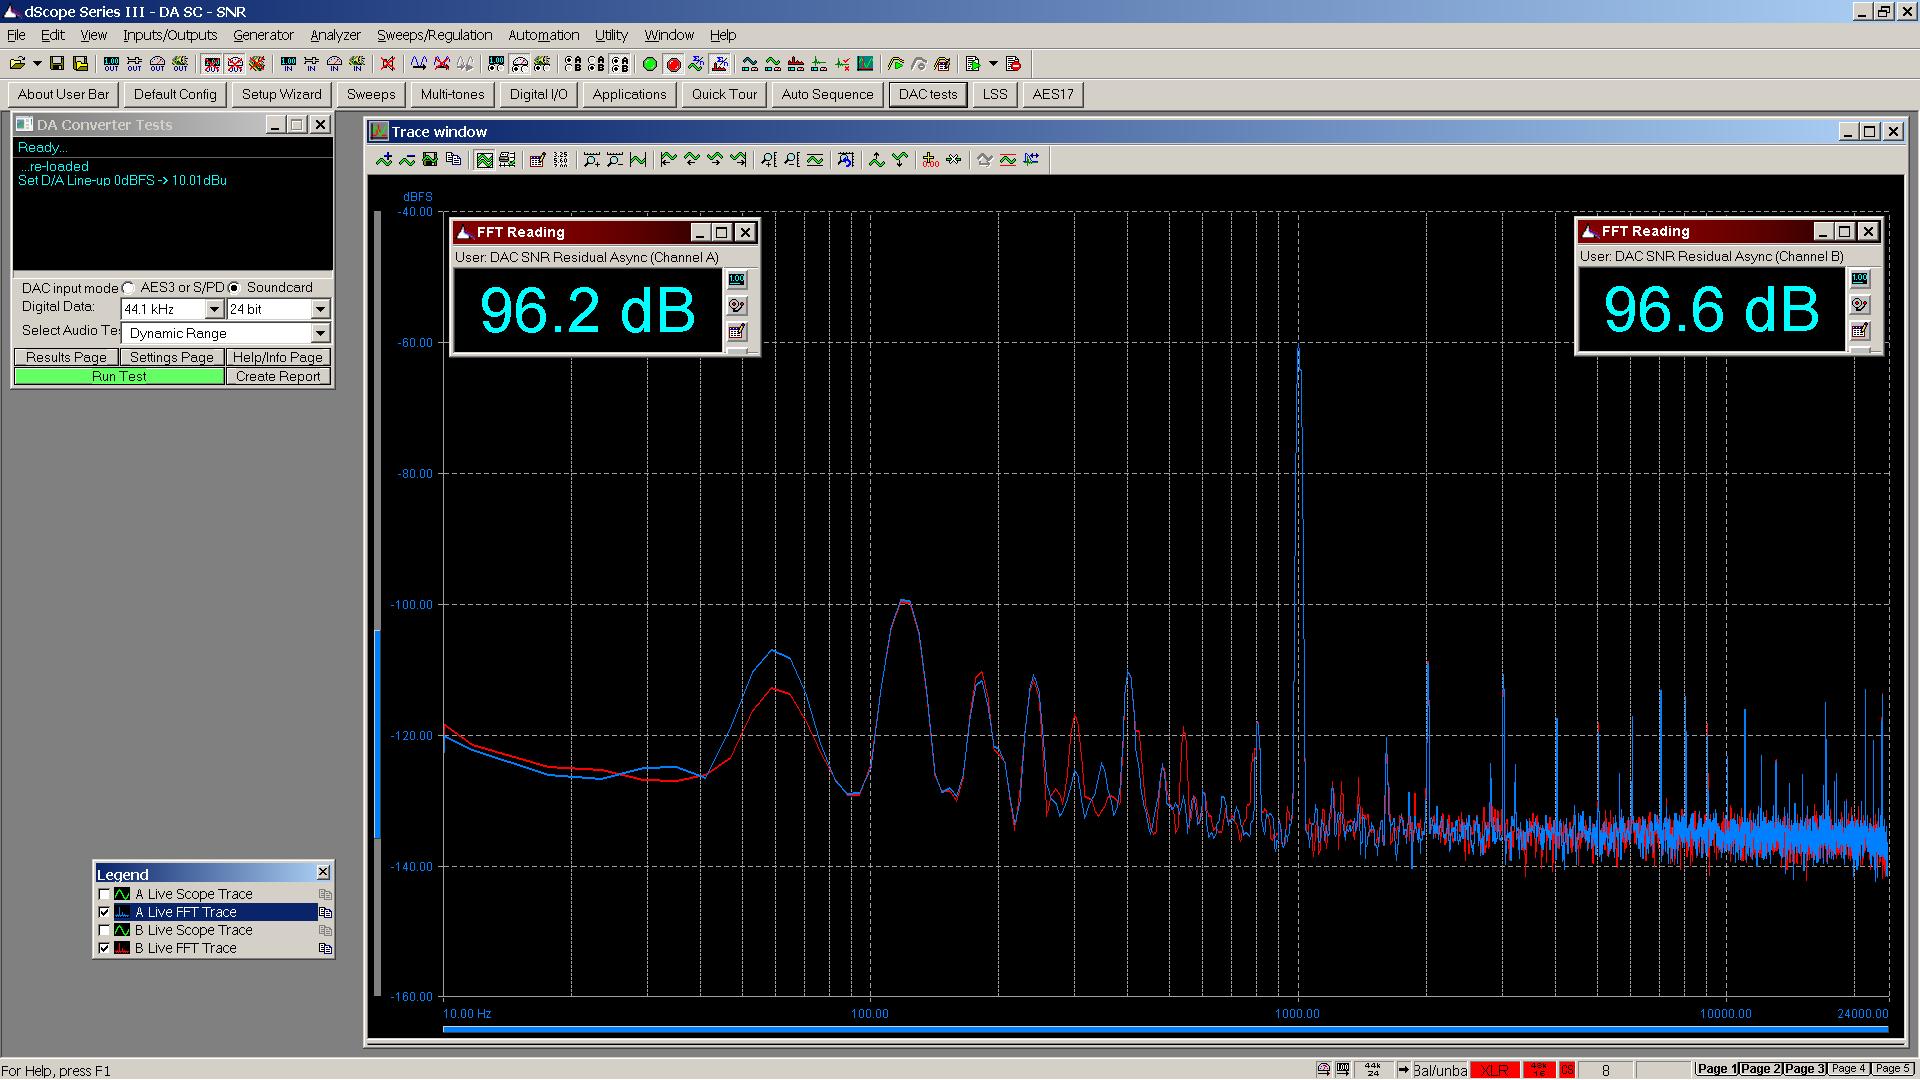 20170423 Audio-gd S19 SE dynamic range - USB.PNG